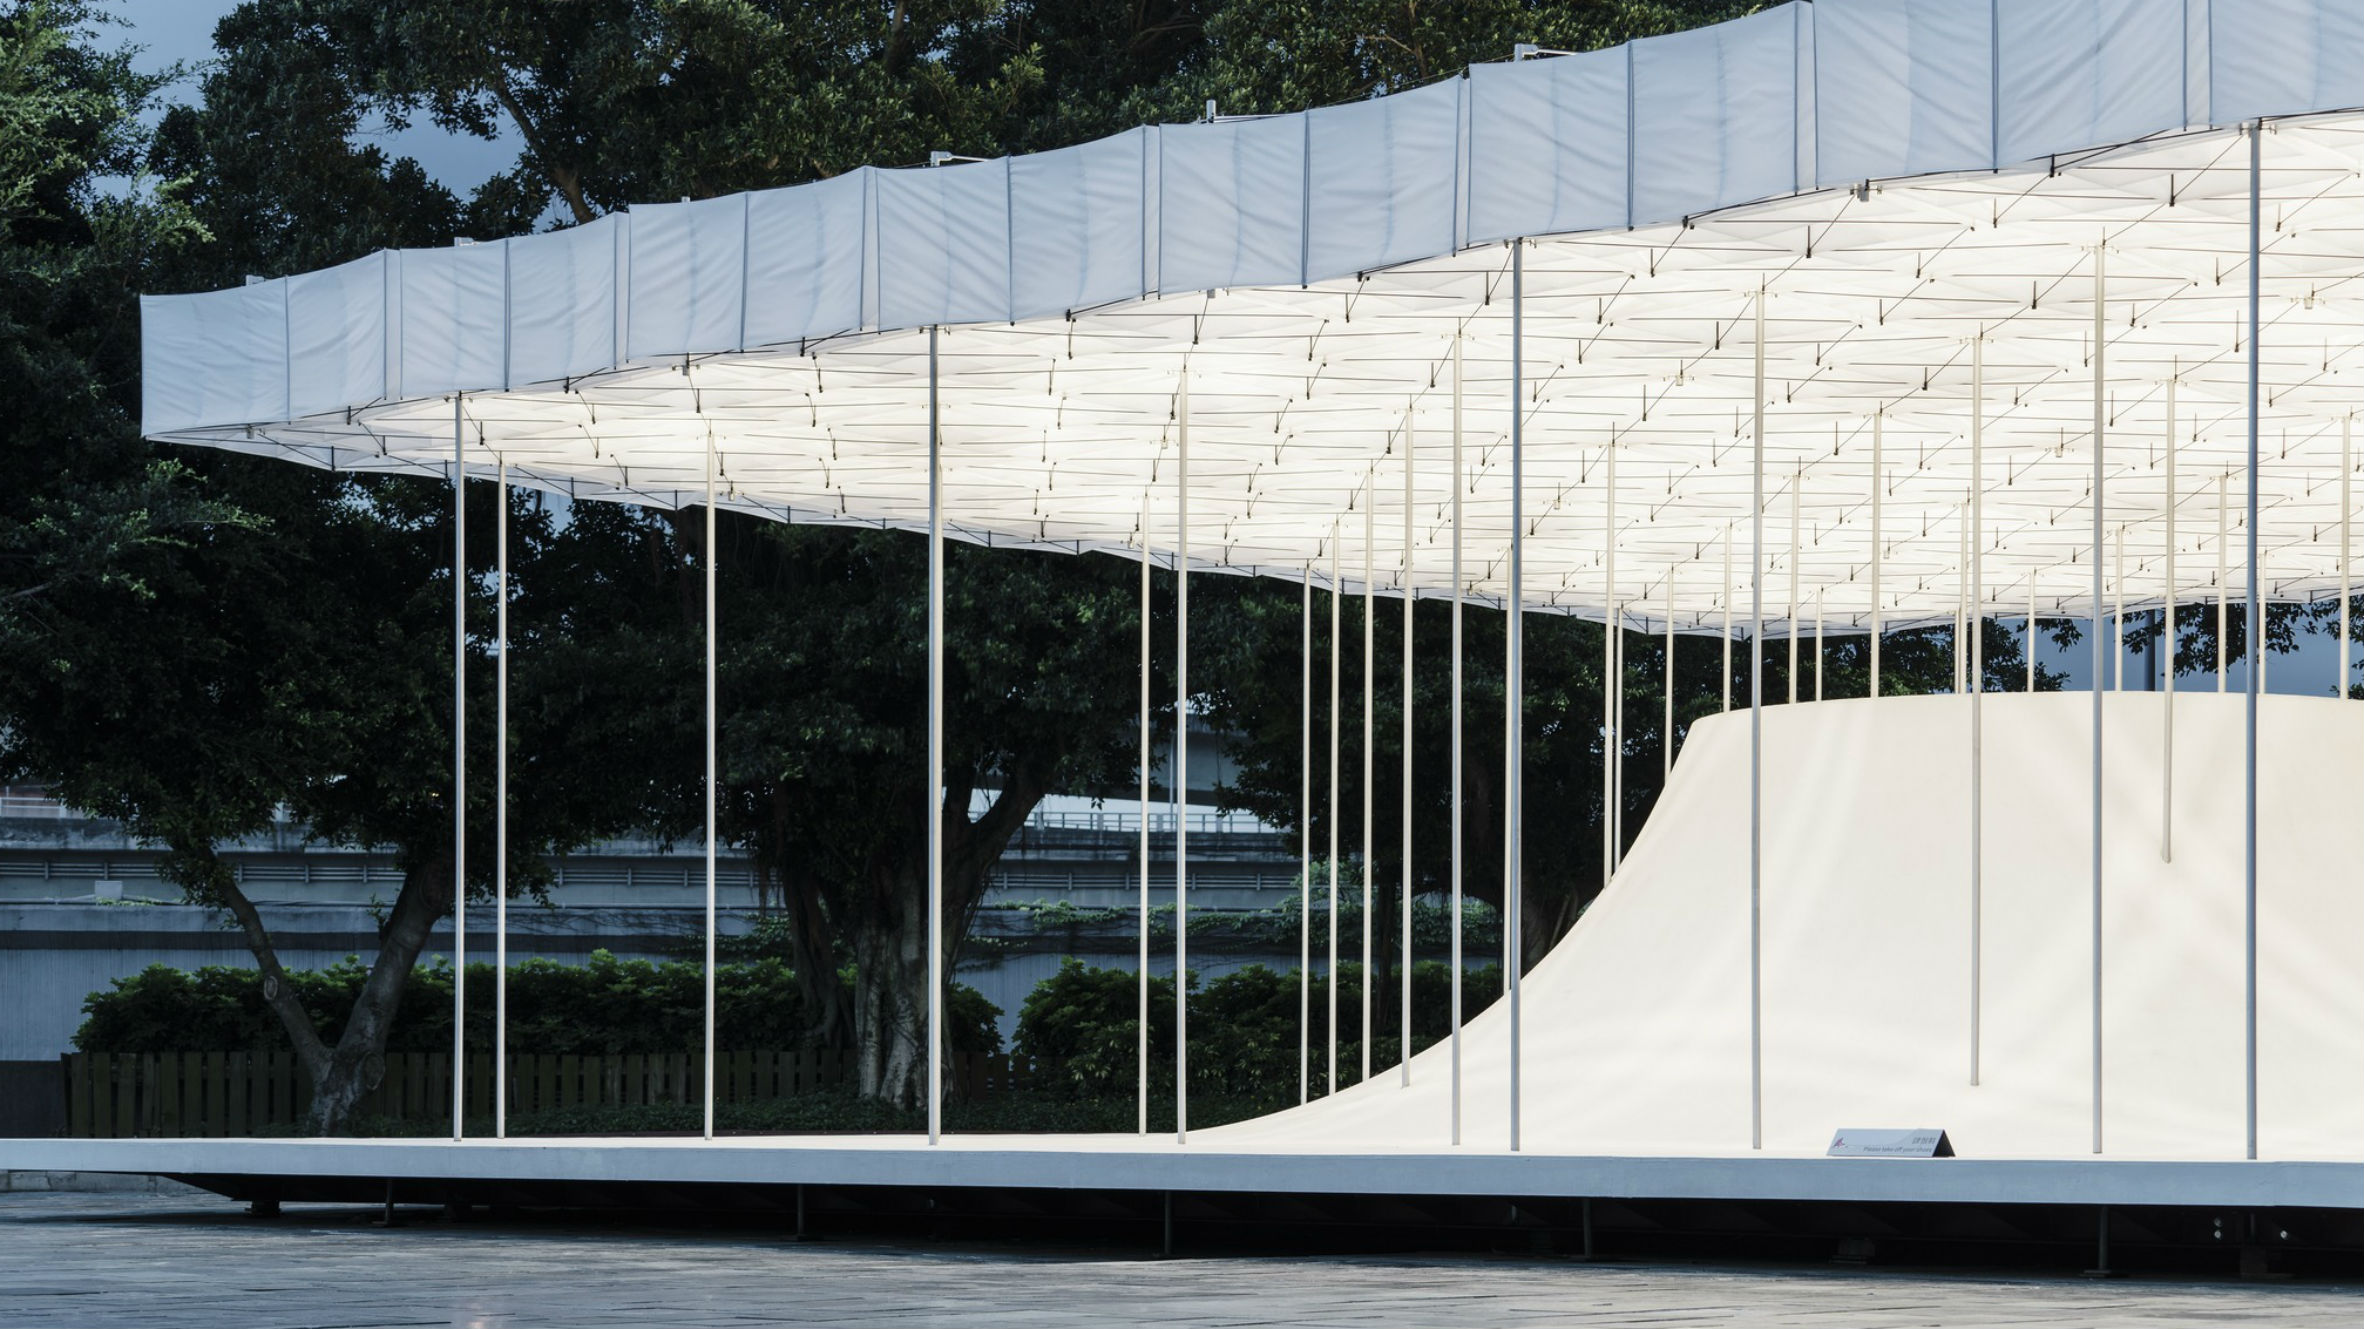 Floating Pavilion, Taipei, Taiwan, by Shen Ting Tseng Architects